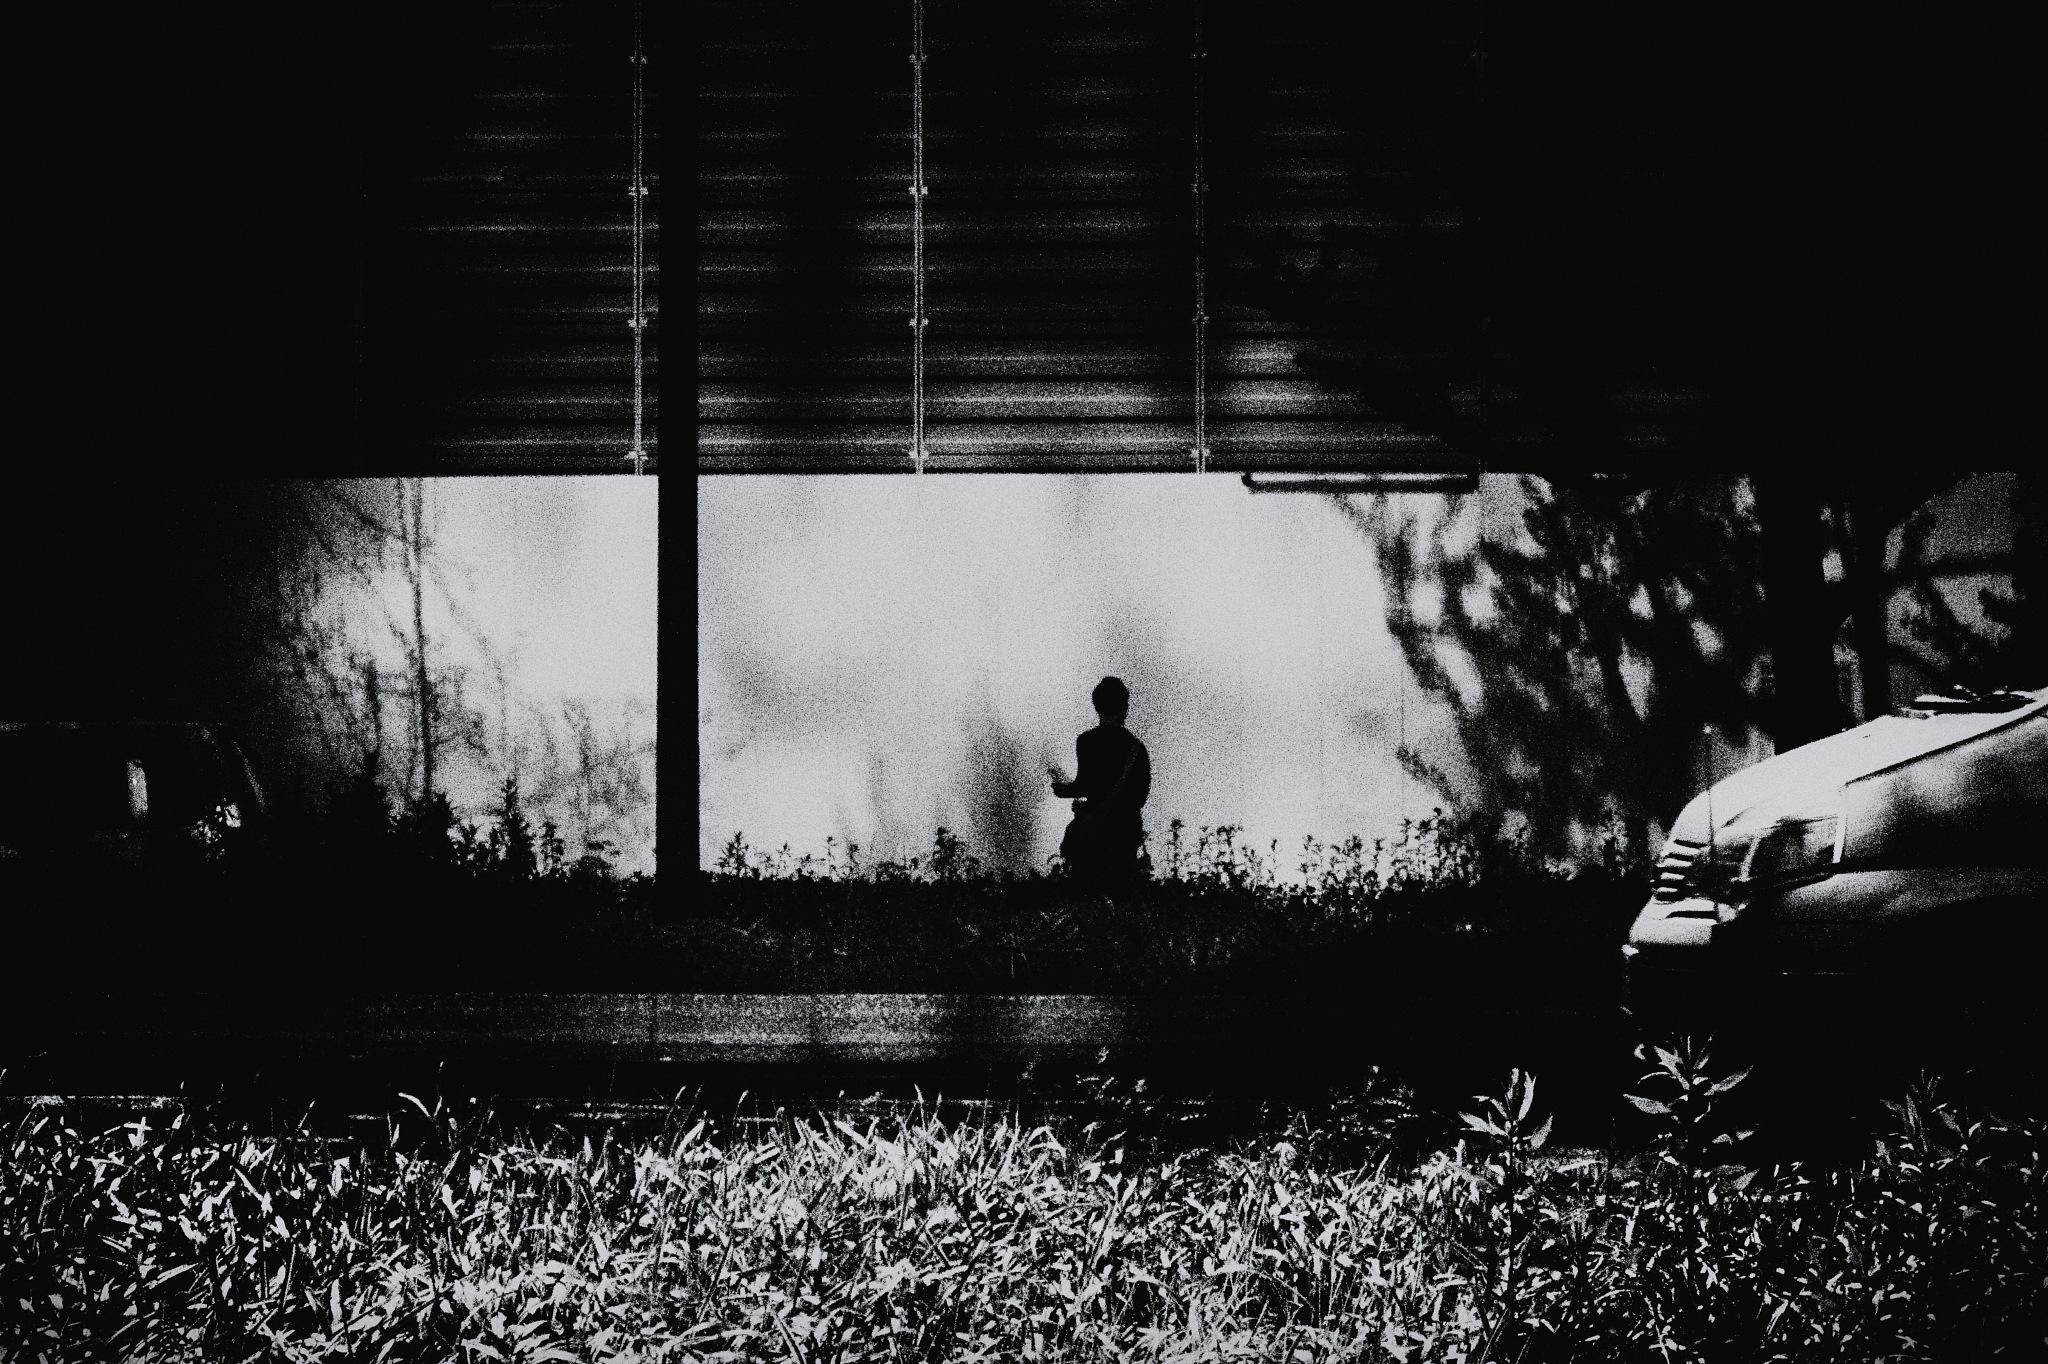 One Day History 188 by Hitoshi Matsumoto